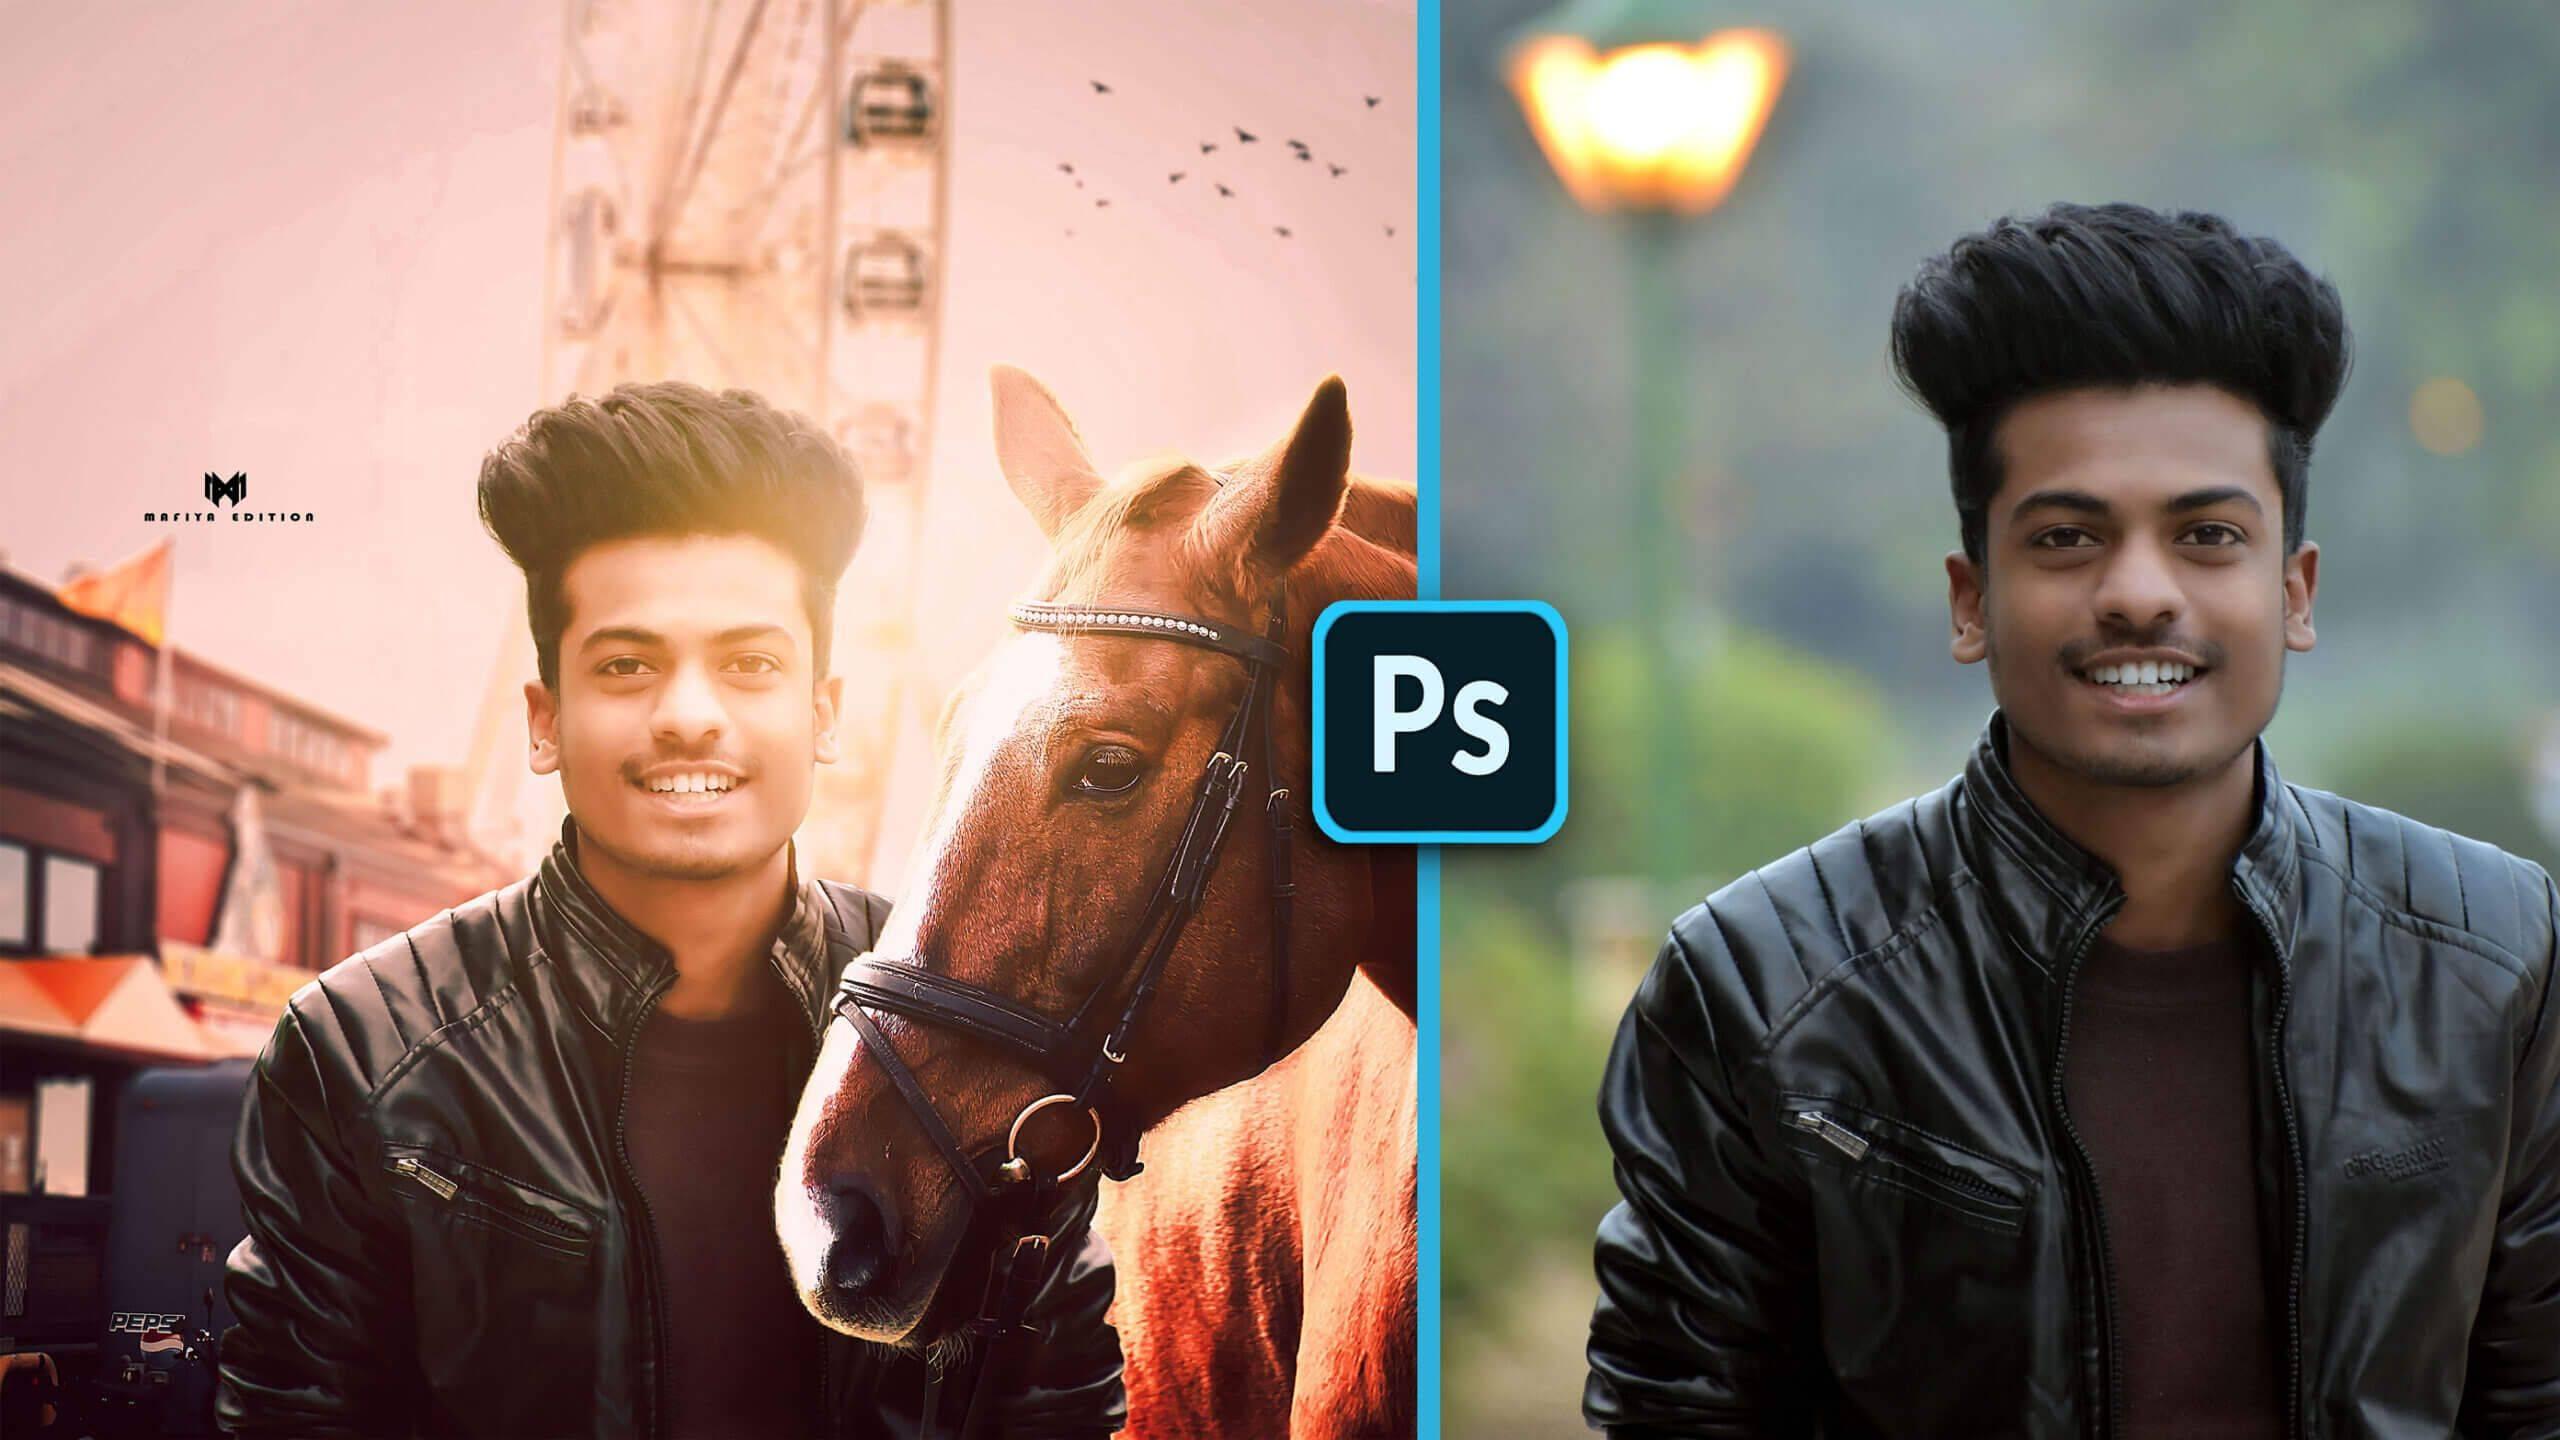 Photoshop Manipulation With Horse